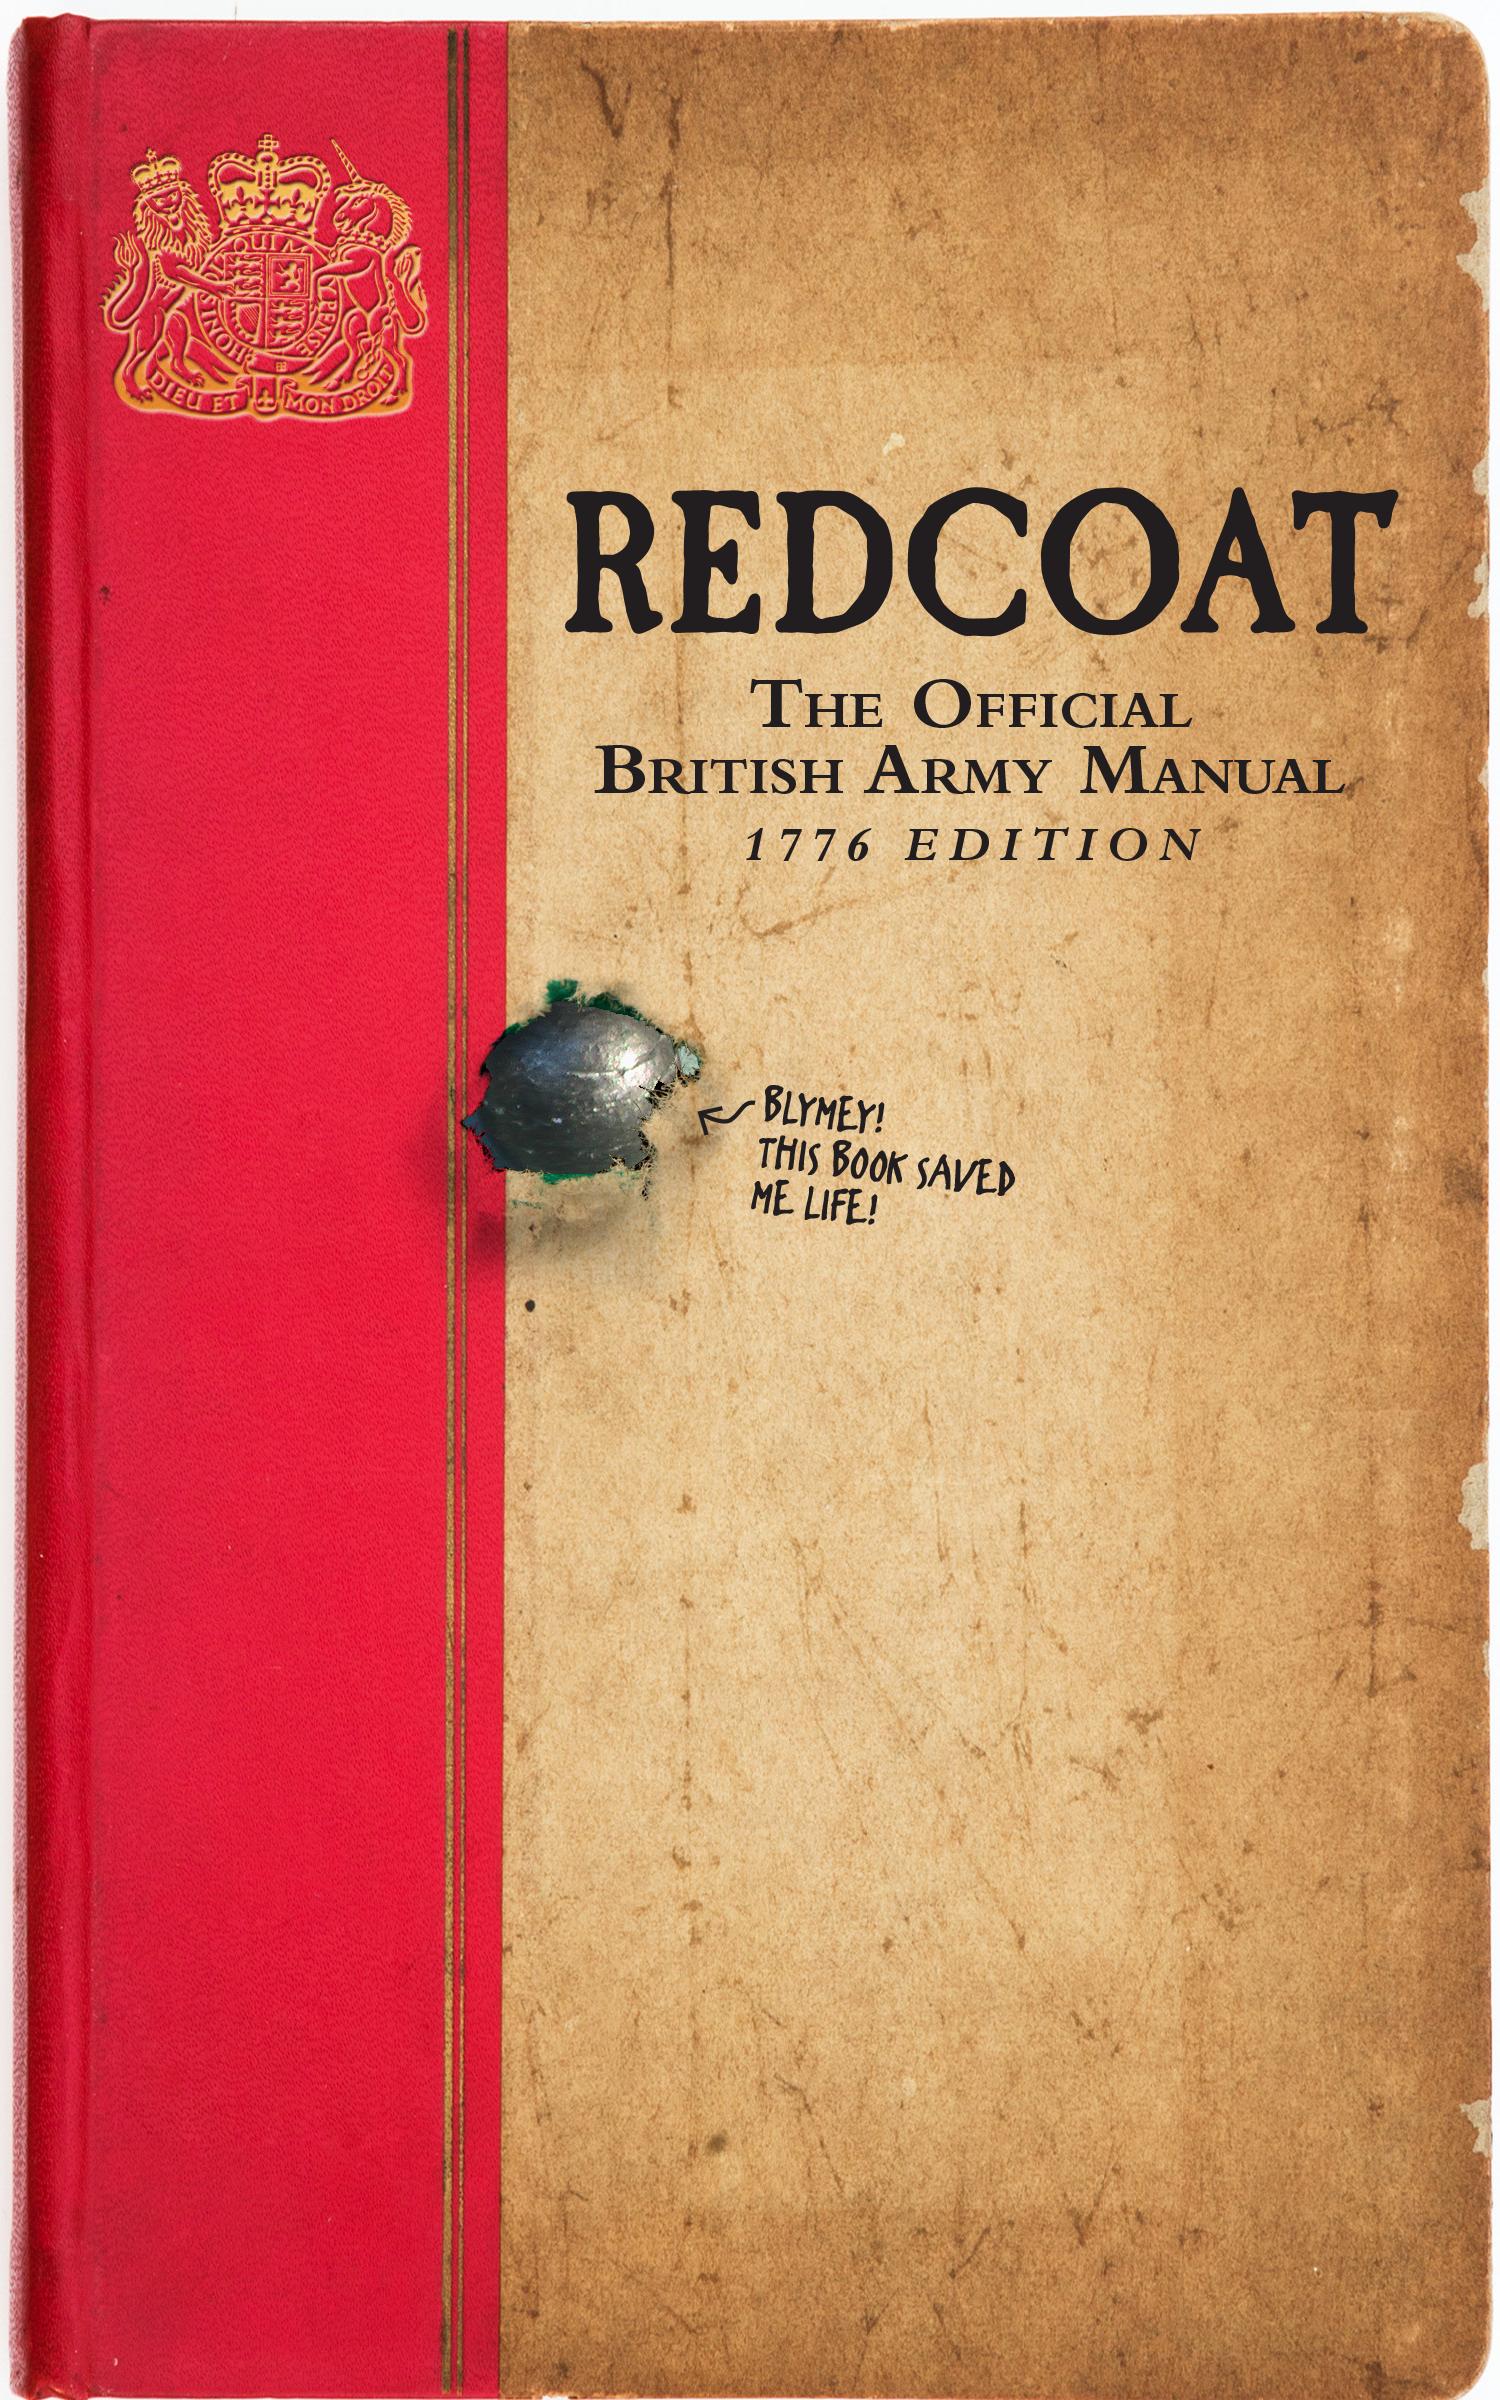 redcoat.png